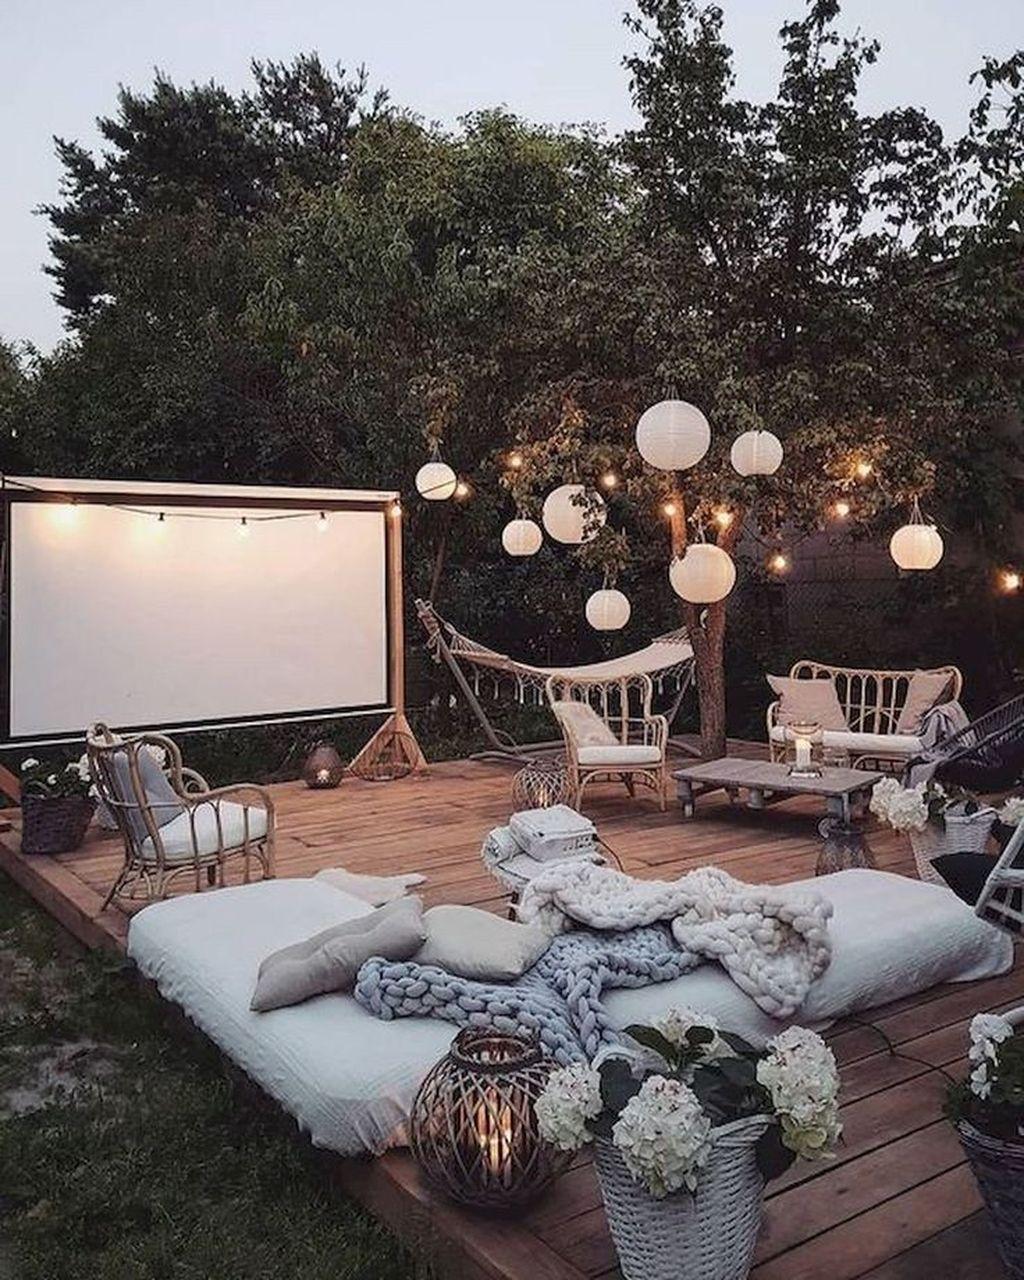 Stunning Summer Backyard Decoration Ideas 23